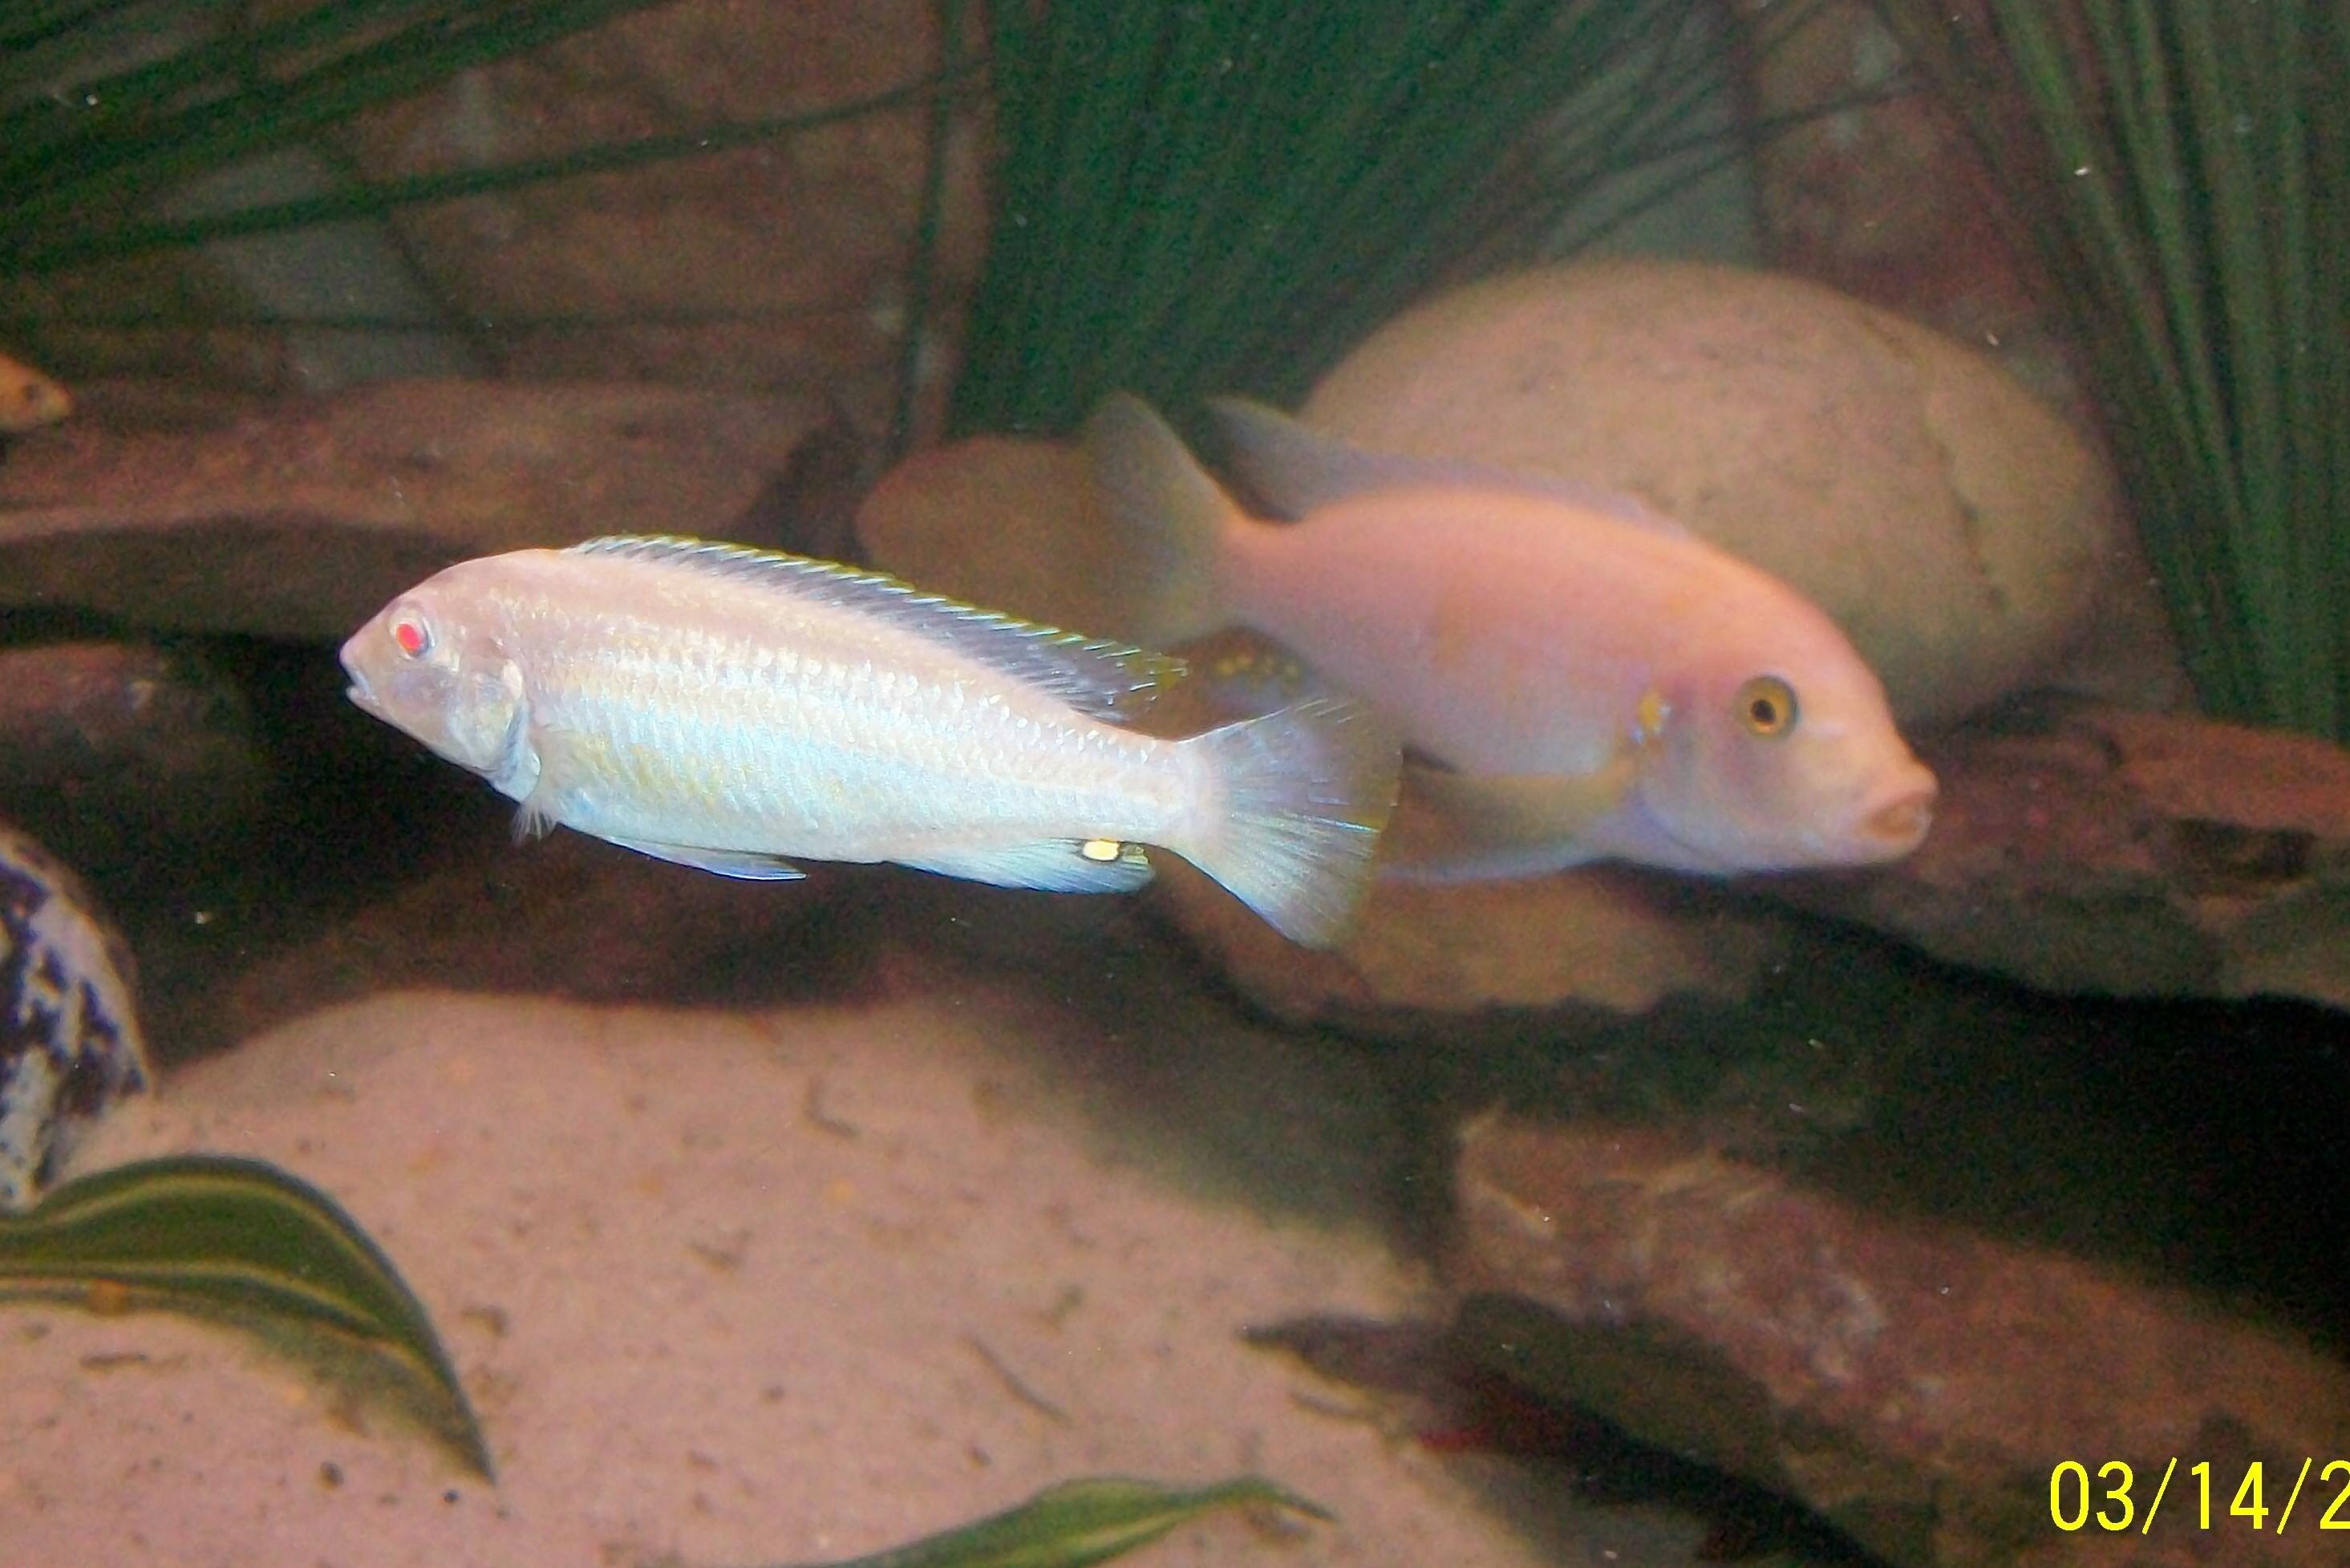 cichlids.com: Albino Auratus female and Red Zebra male